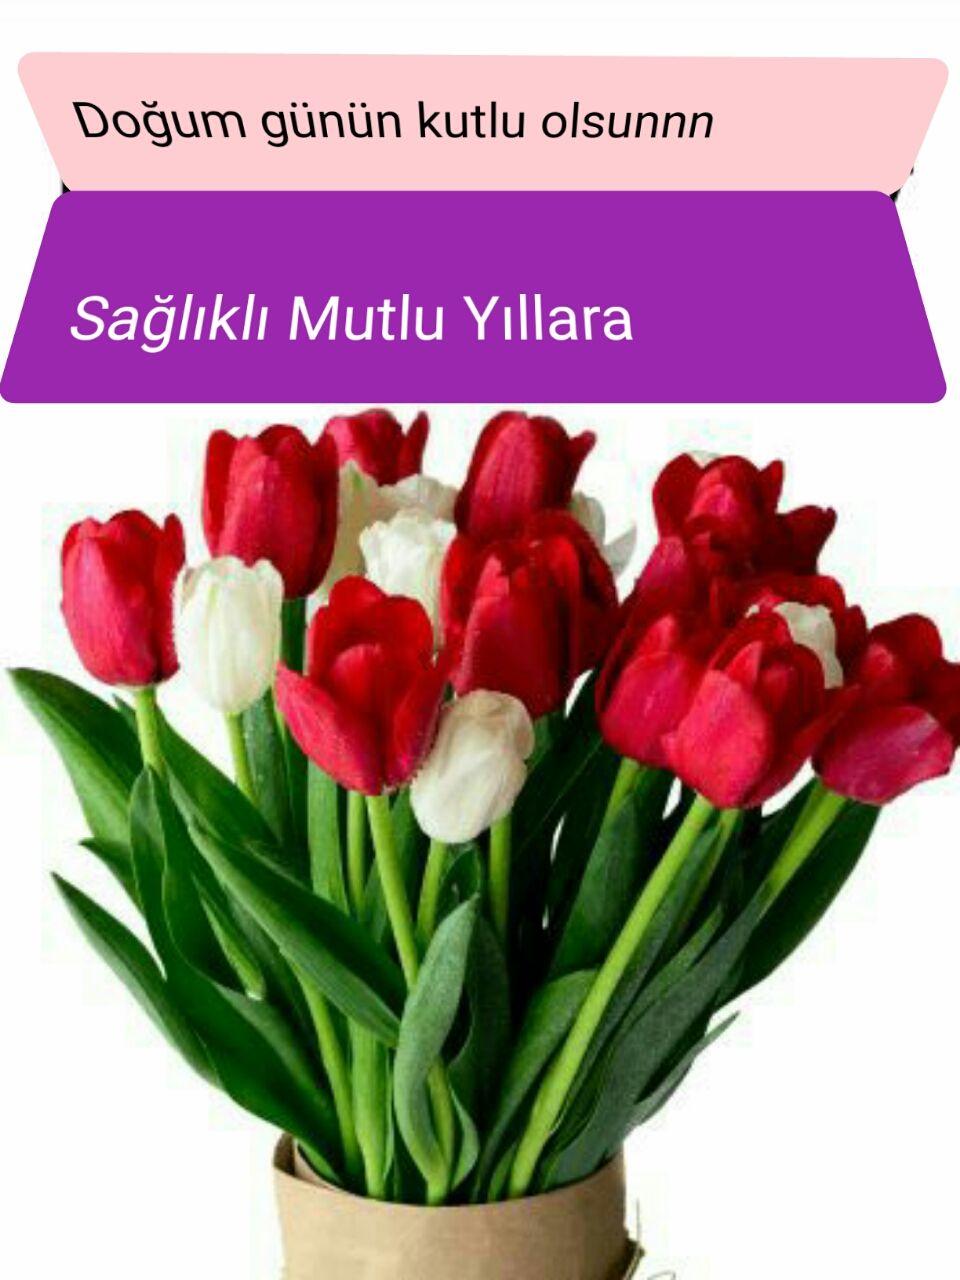 Dogum Gunu Resimleri Muhtesem Cok Iyi Abi Happy Birthday Flower Birthday Wishes Flowers Happy Birthday Wishes Cards